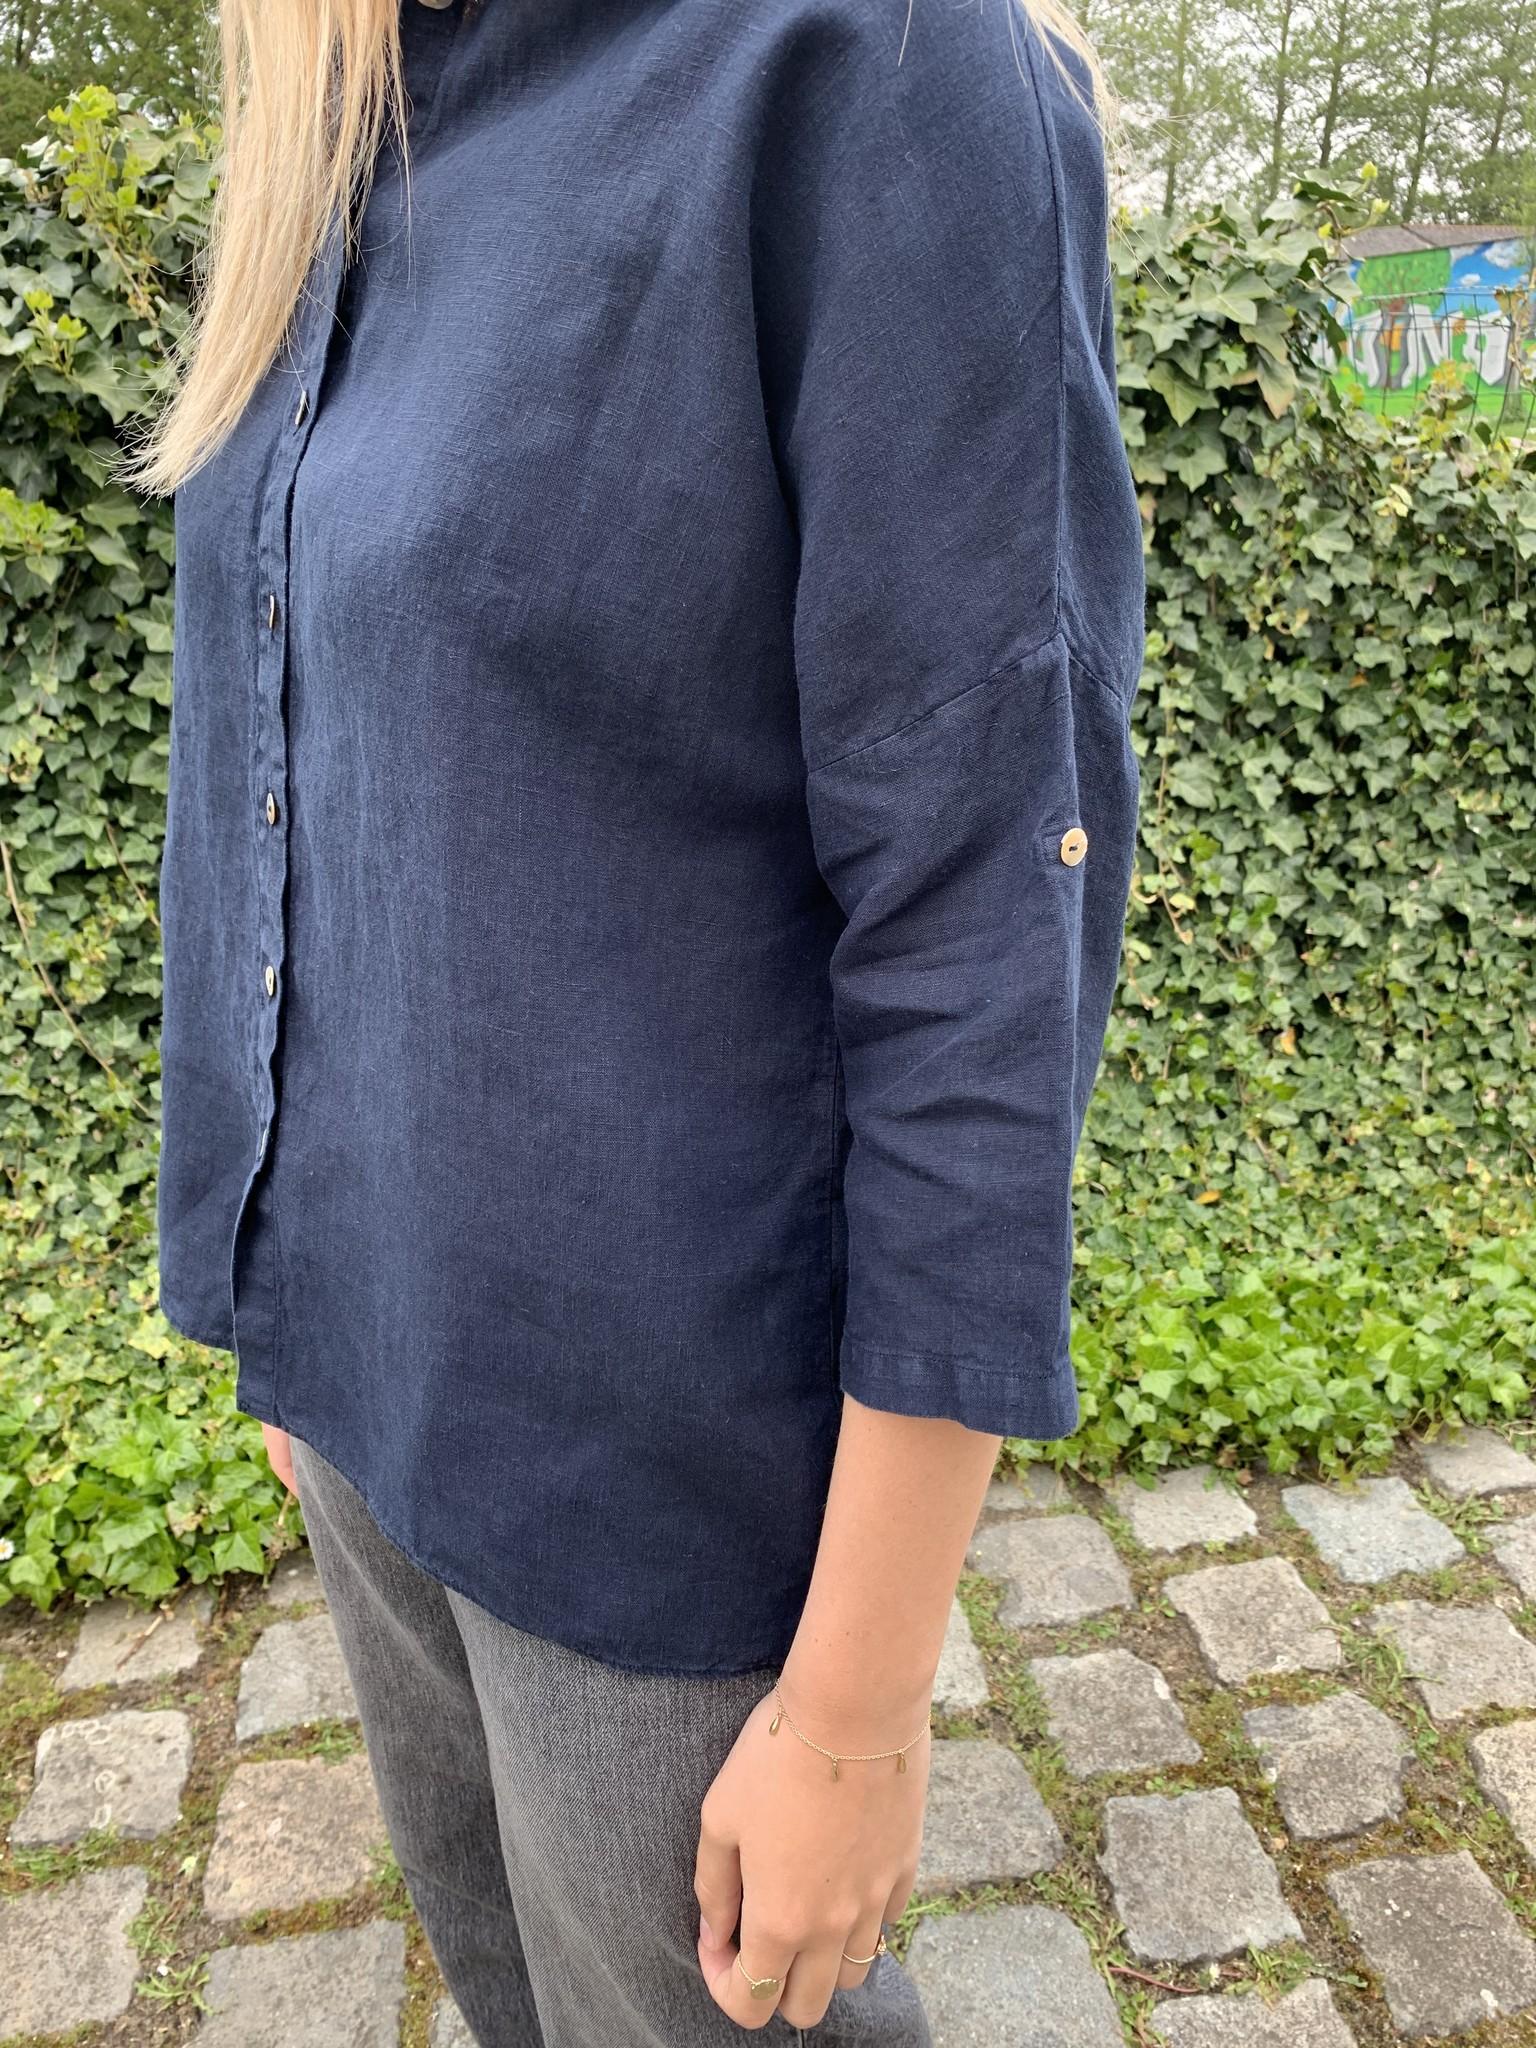 grote blouse in marineblauw linnen